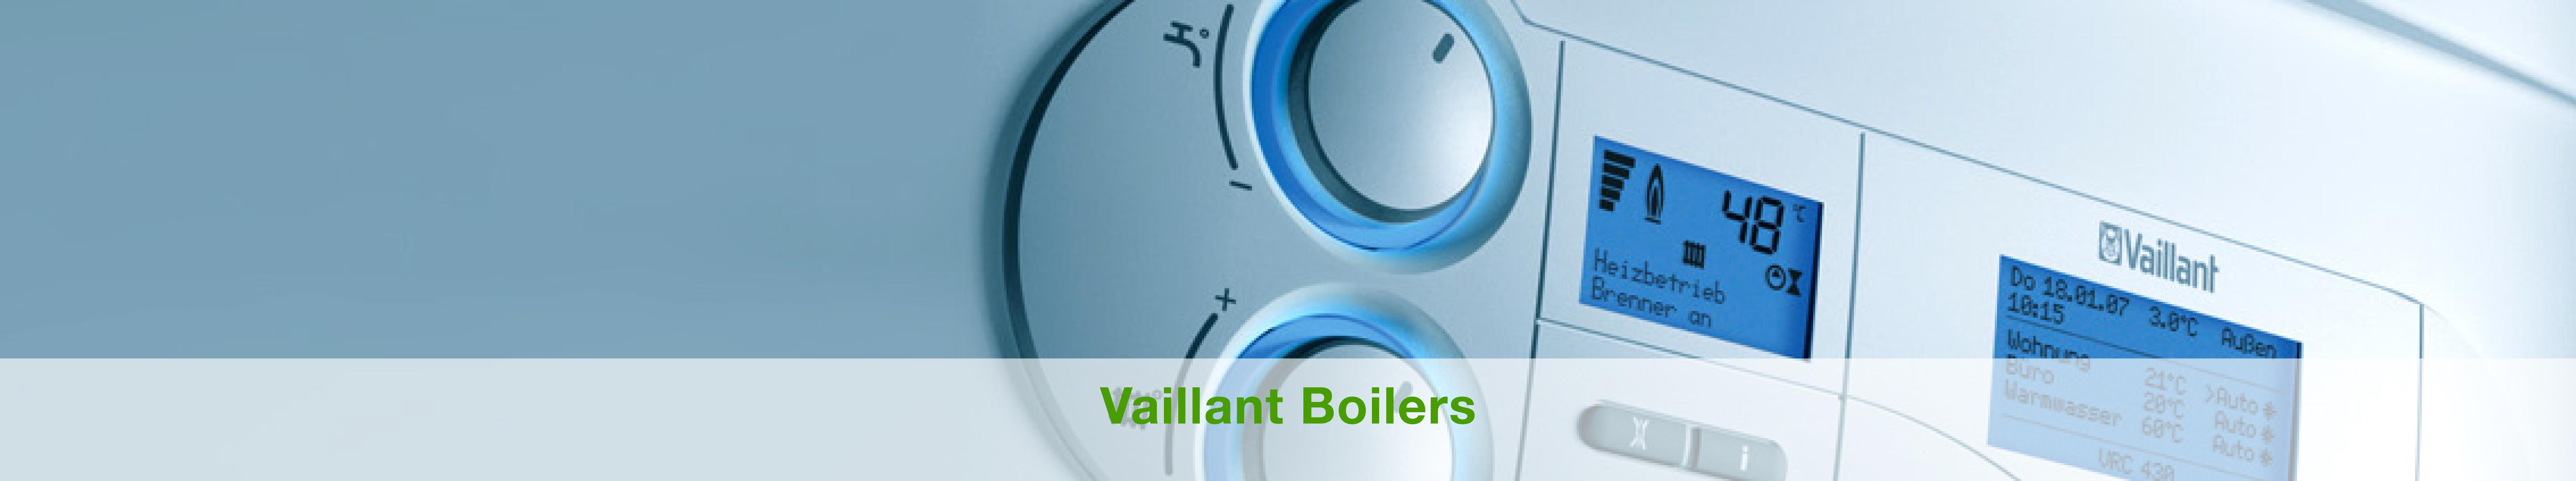 Vaillant Boilers Weybridge, Gas Boiler Installation Kingston